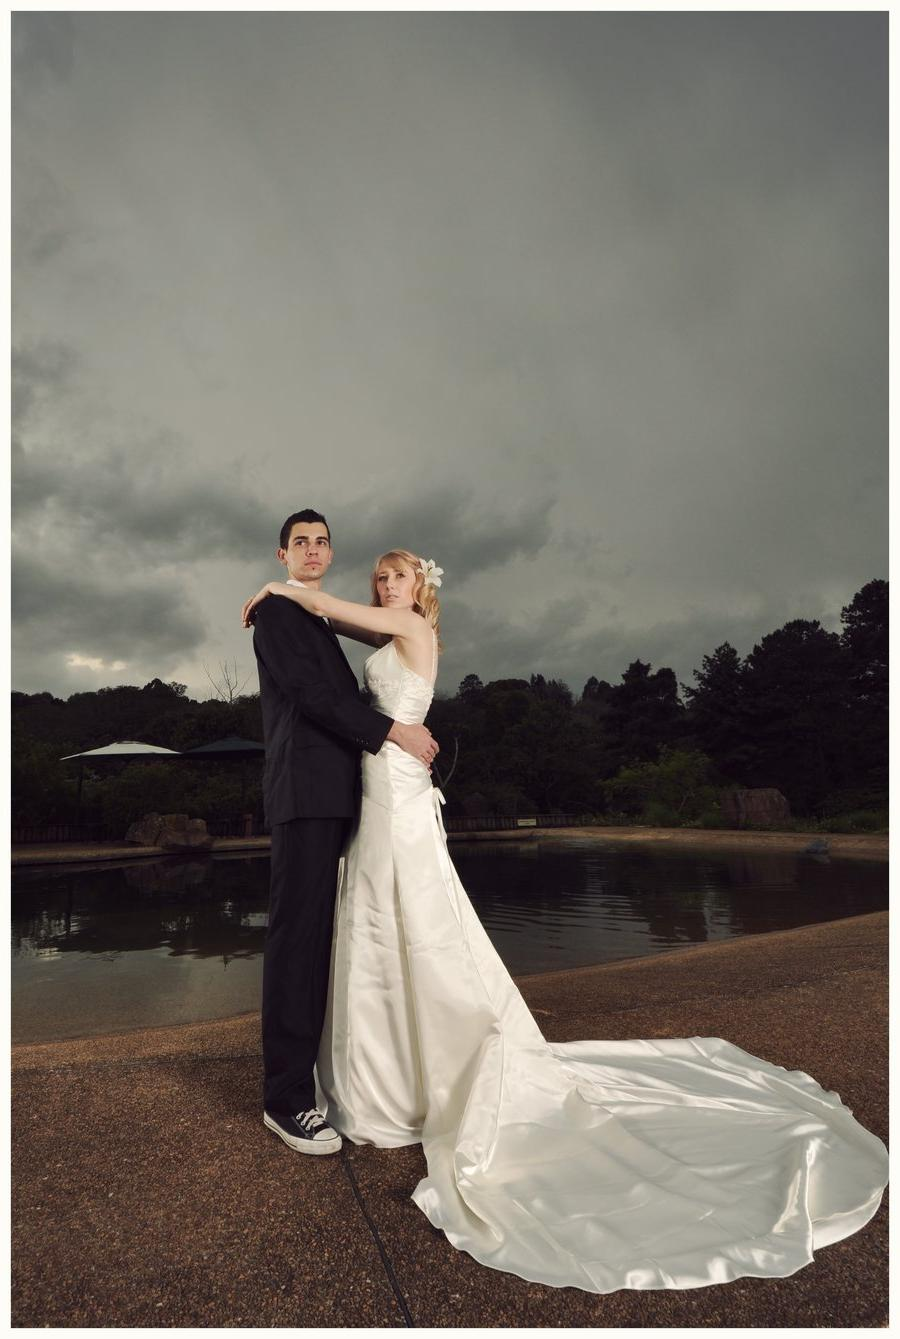 Wedding Bells by  FromSleepyHollow on deviantART